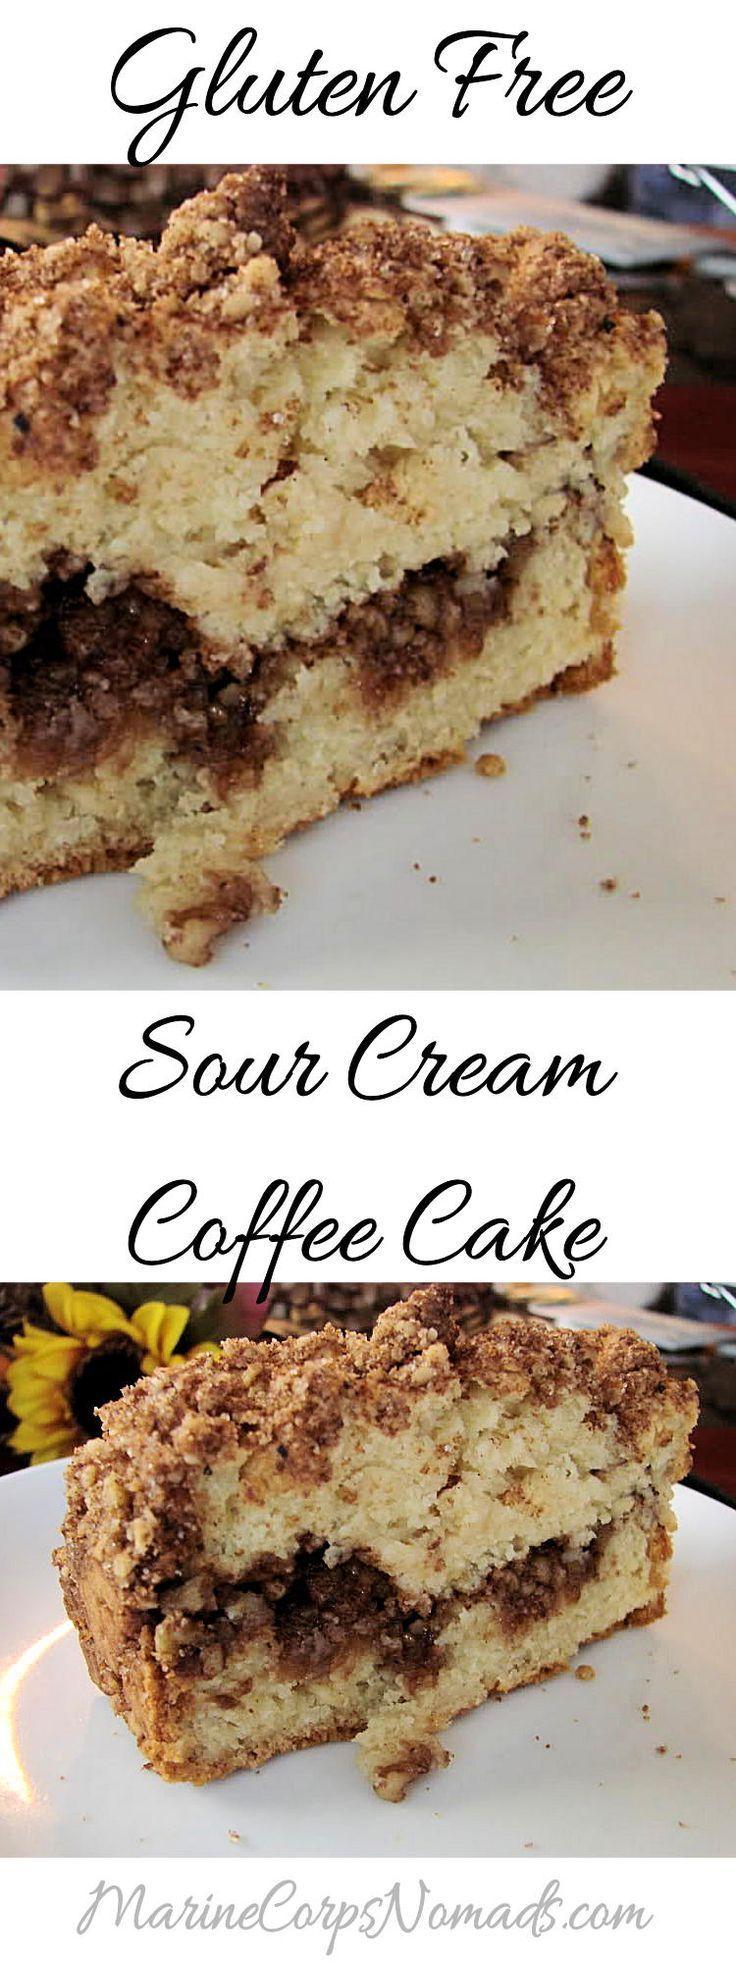 Gluten Free Sour Cream Coffee Cake Recipe Gluten free